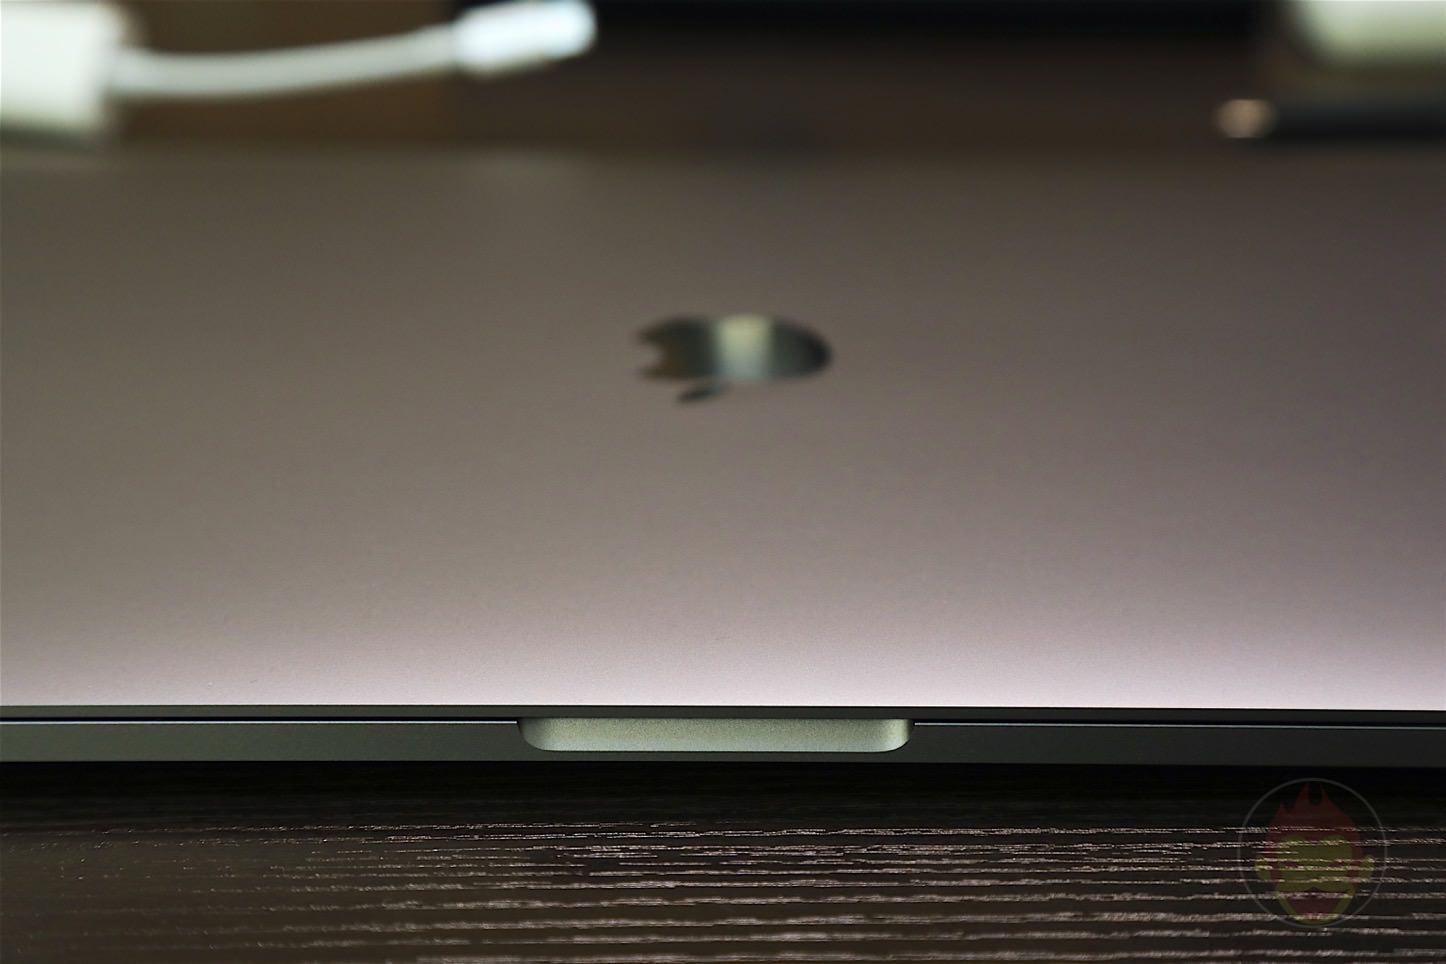 MacBook-Pro-Late-2016-15inch-model-18.jpg